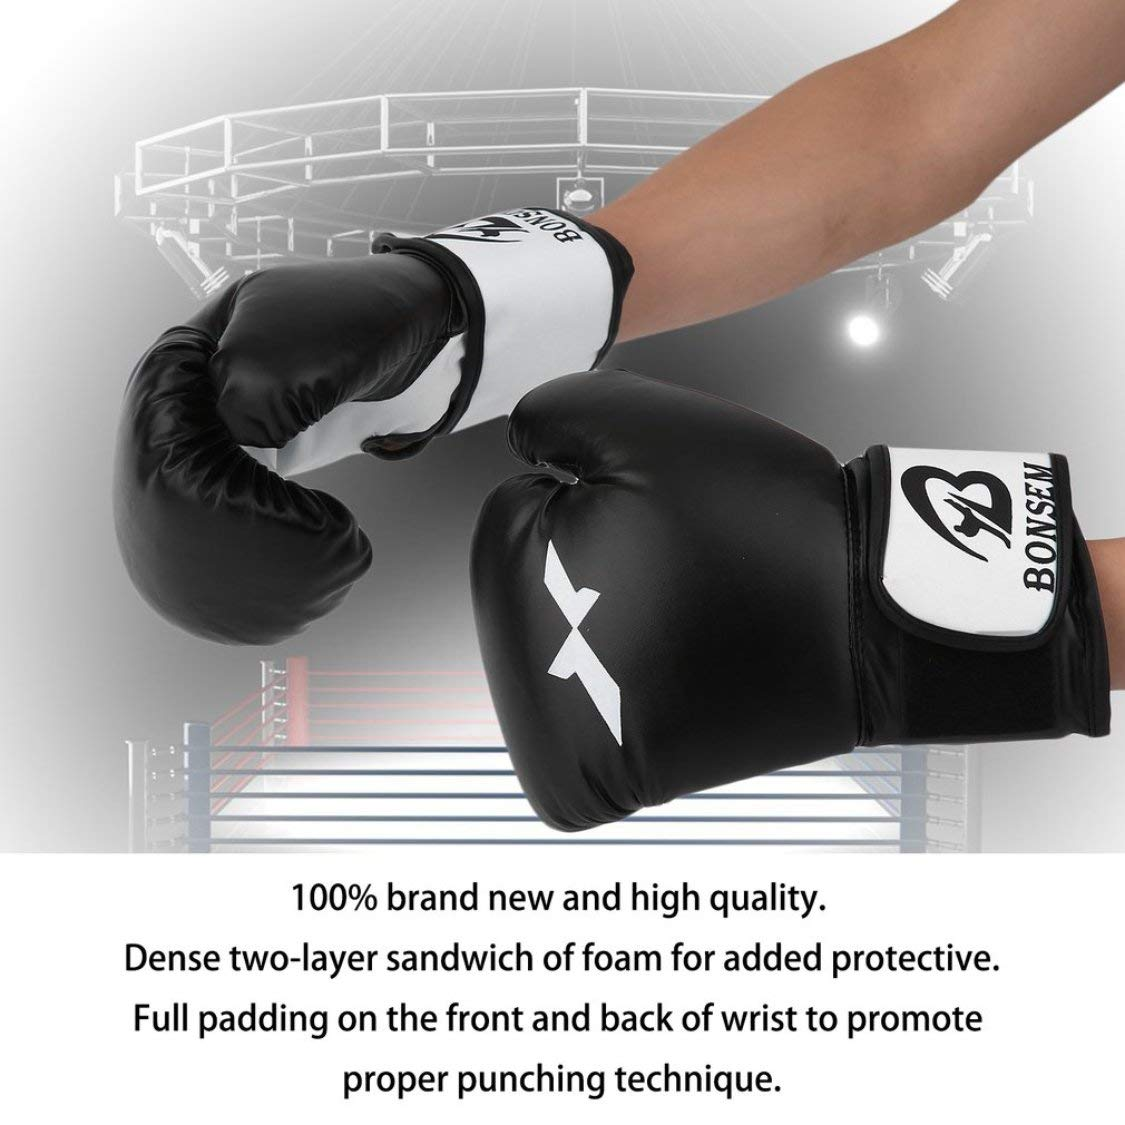 Vige Komfortable Design PU-Leder-Trainingshandschuhe Neue Art Boxhandschuhe 2 Farben Optional Boxing Zubeh/ör